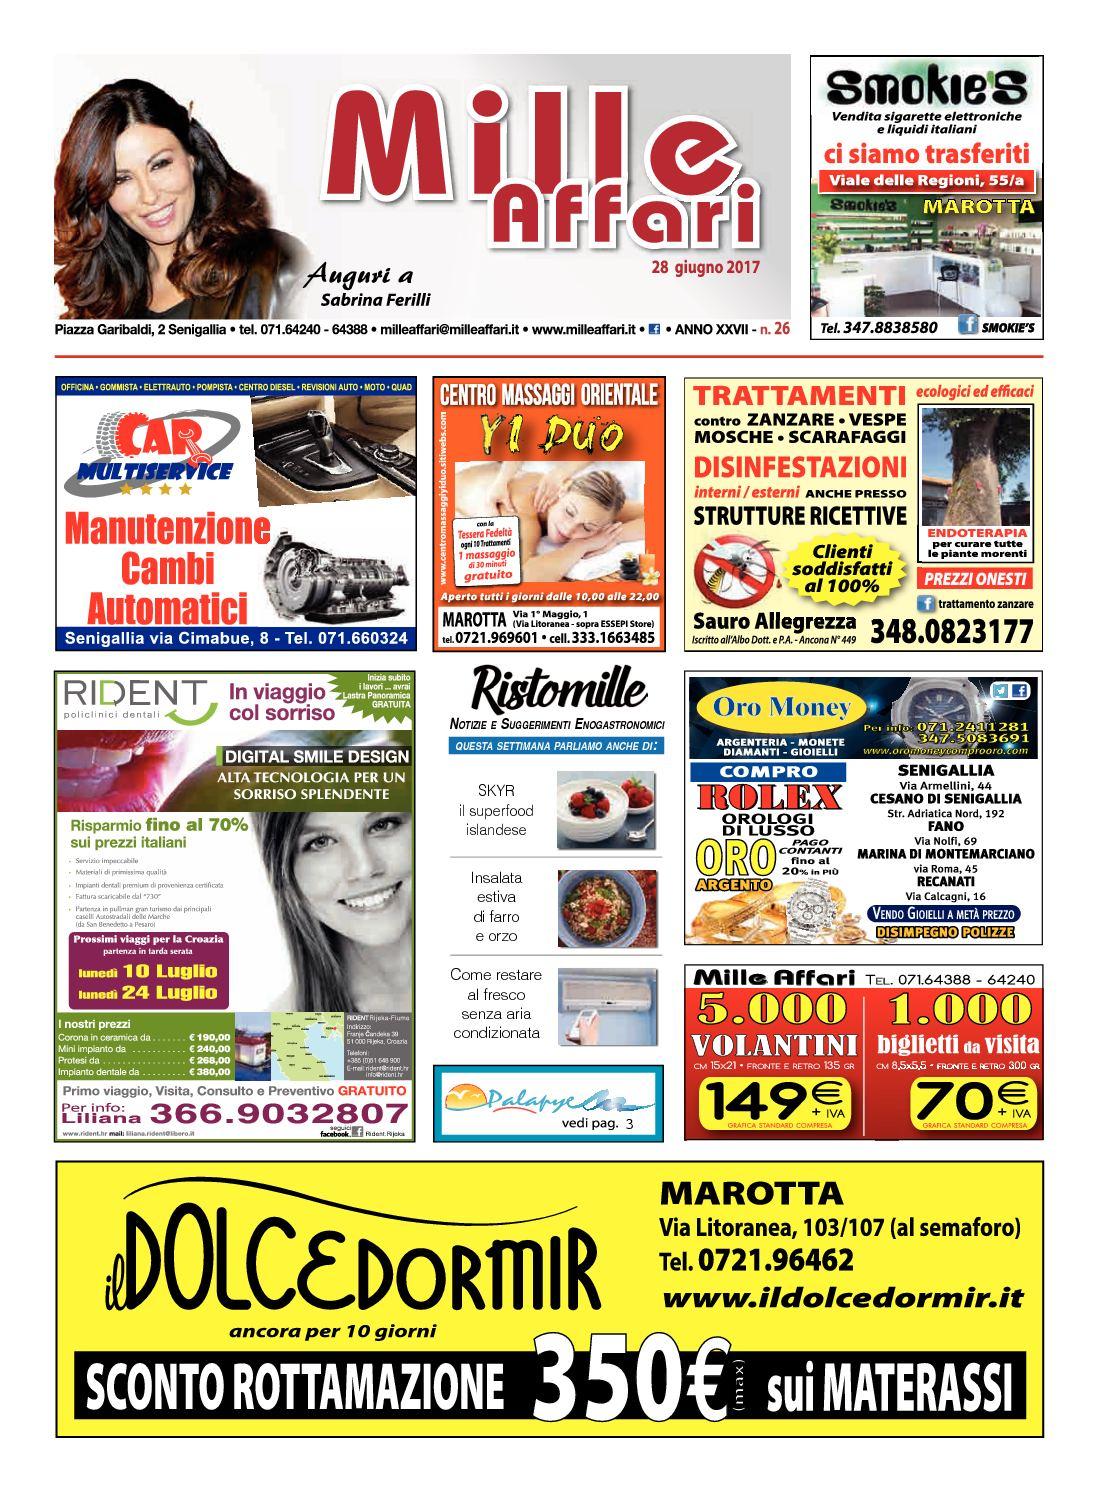 editor video free massaggi integrali roma